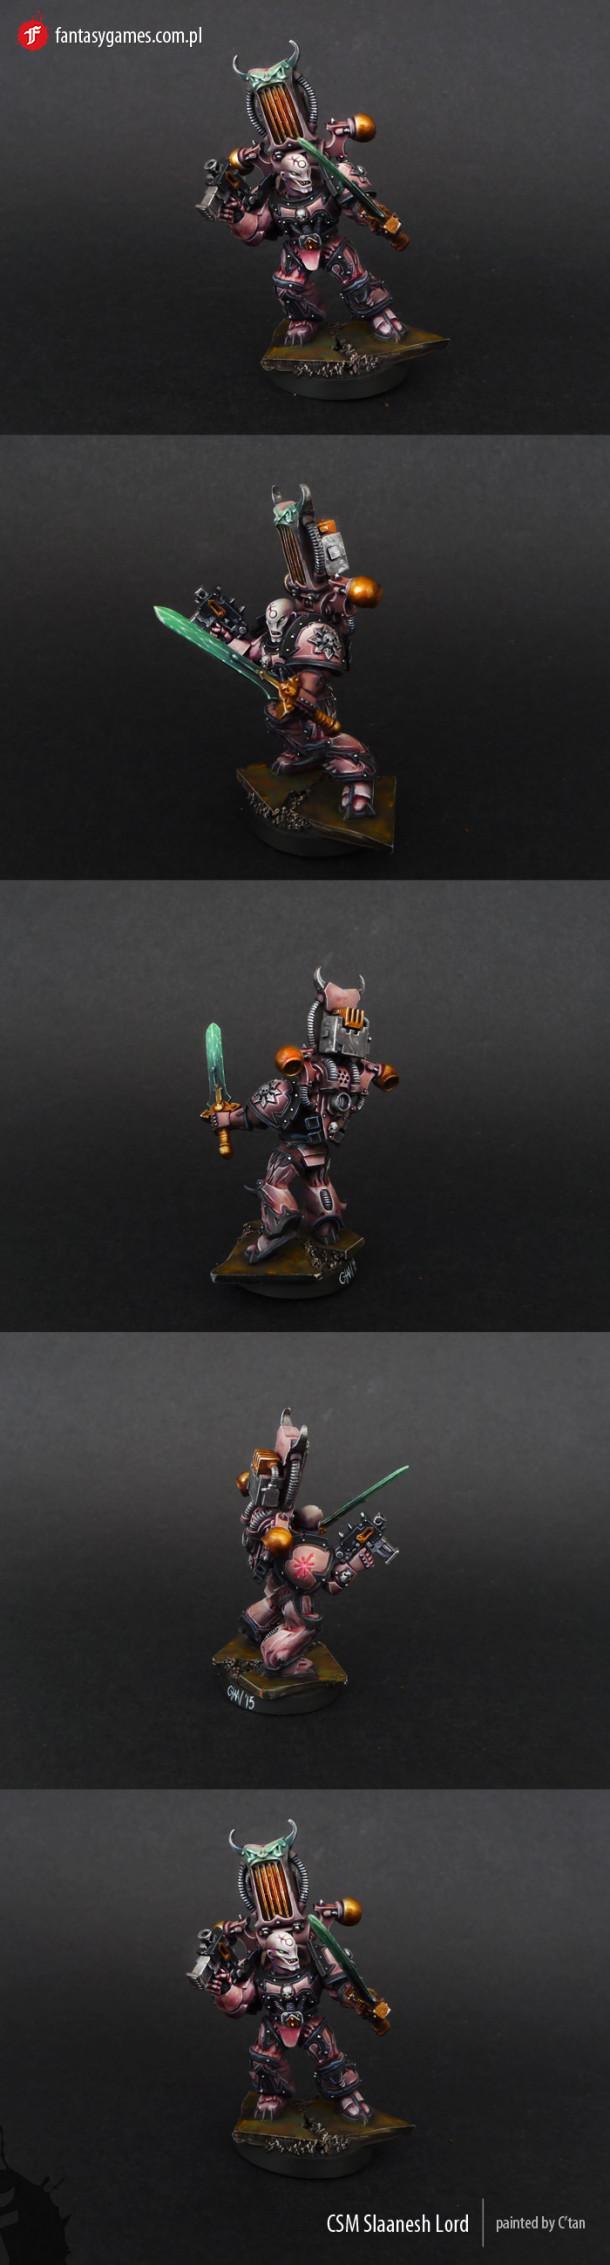 40k - Chaos Space Marine Slaneesh Lord by C'Tan